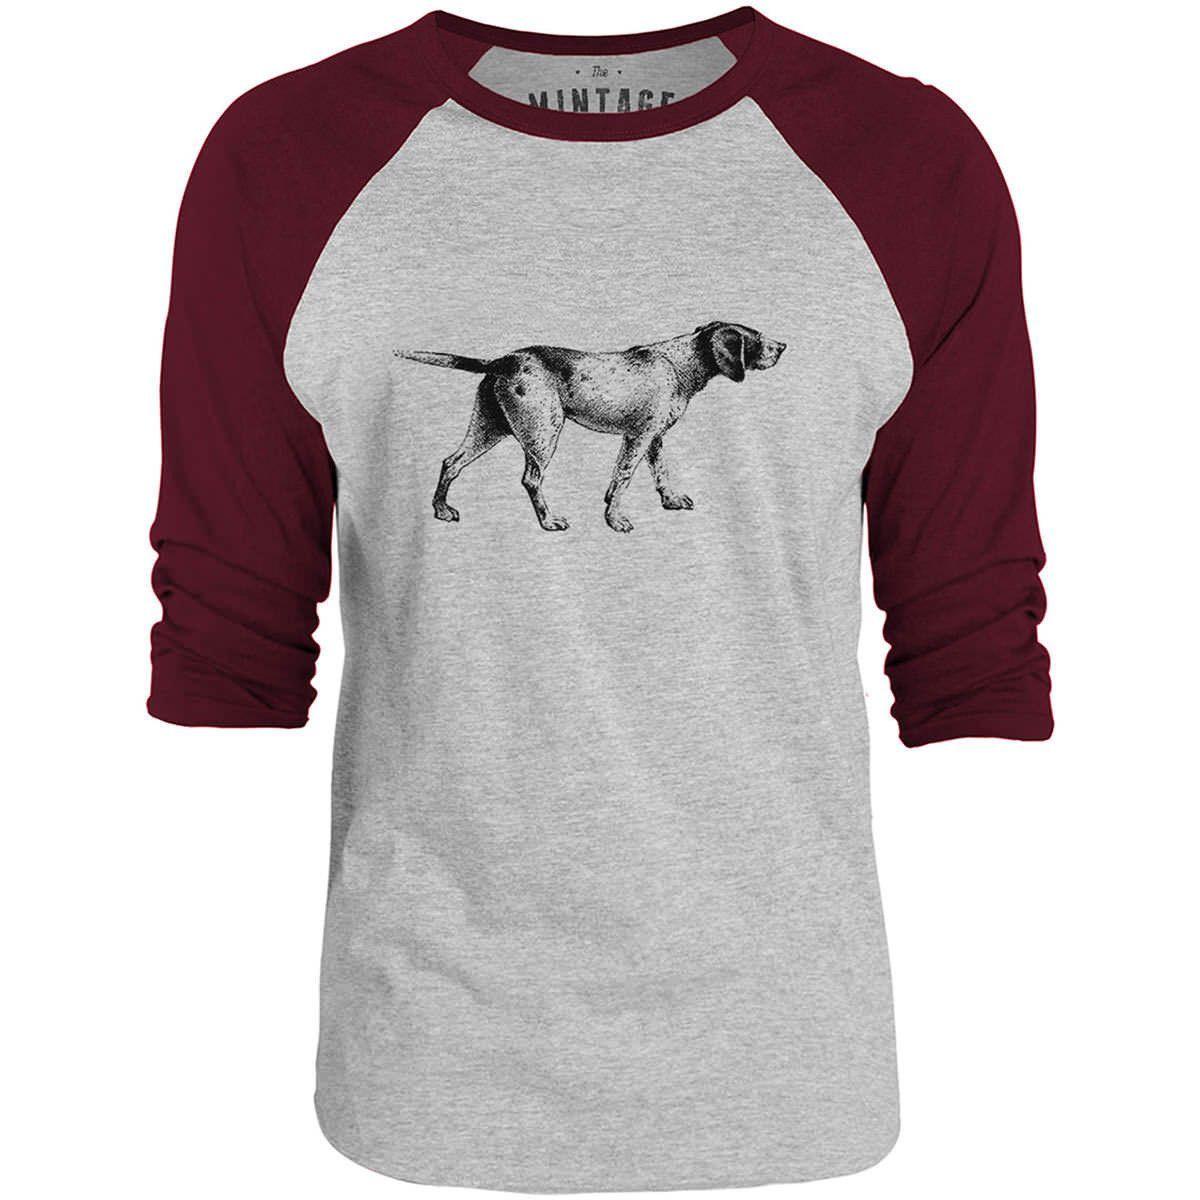 Mintage English Pointer 3/4-Sleeve Raglan Baseball T-Shirt (Grey Marle / Bordeaux)